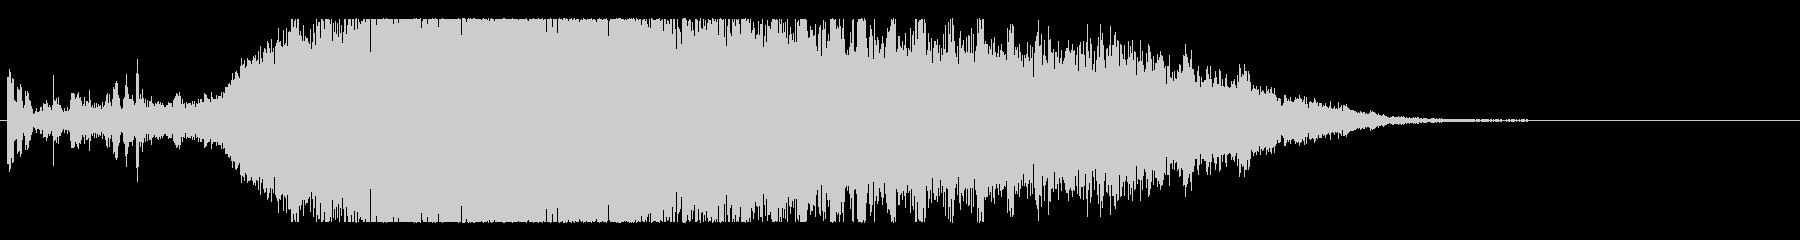 SF 登場音 不穏な 巨大なUMA 出現の未再生の波形